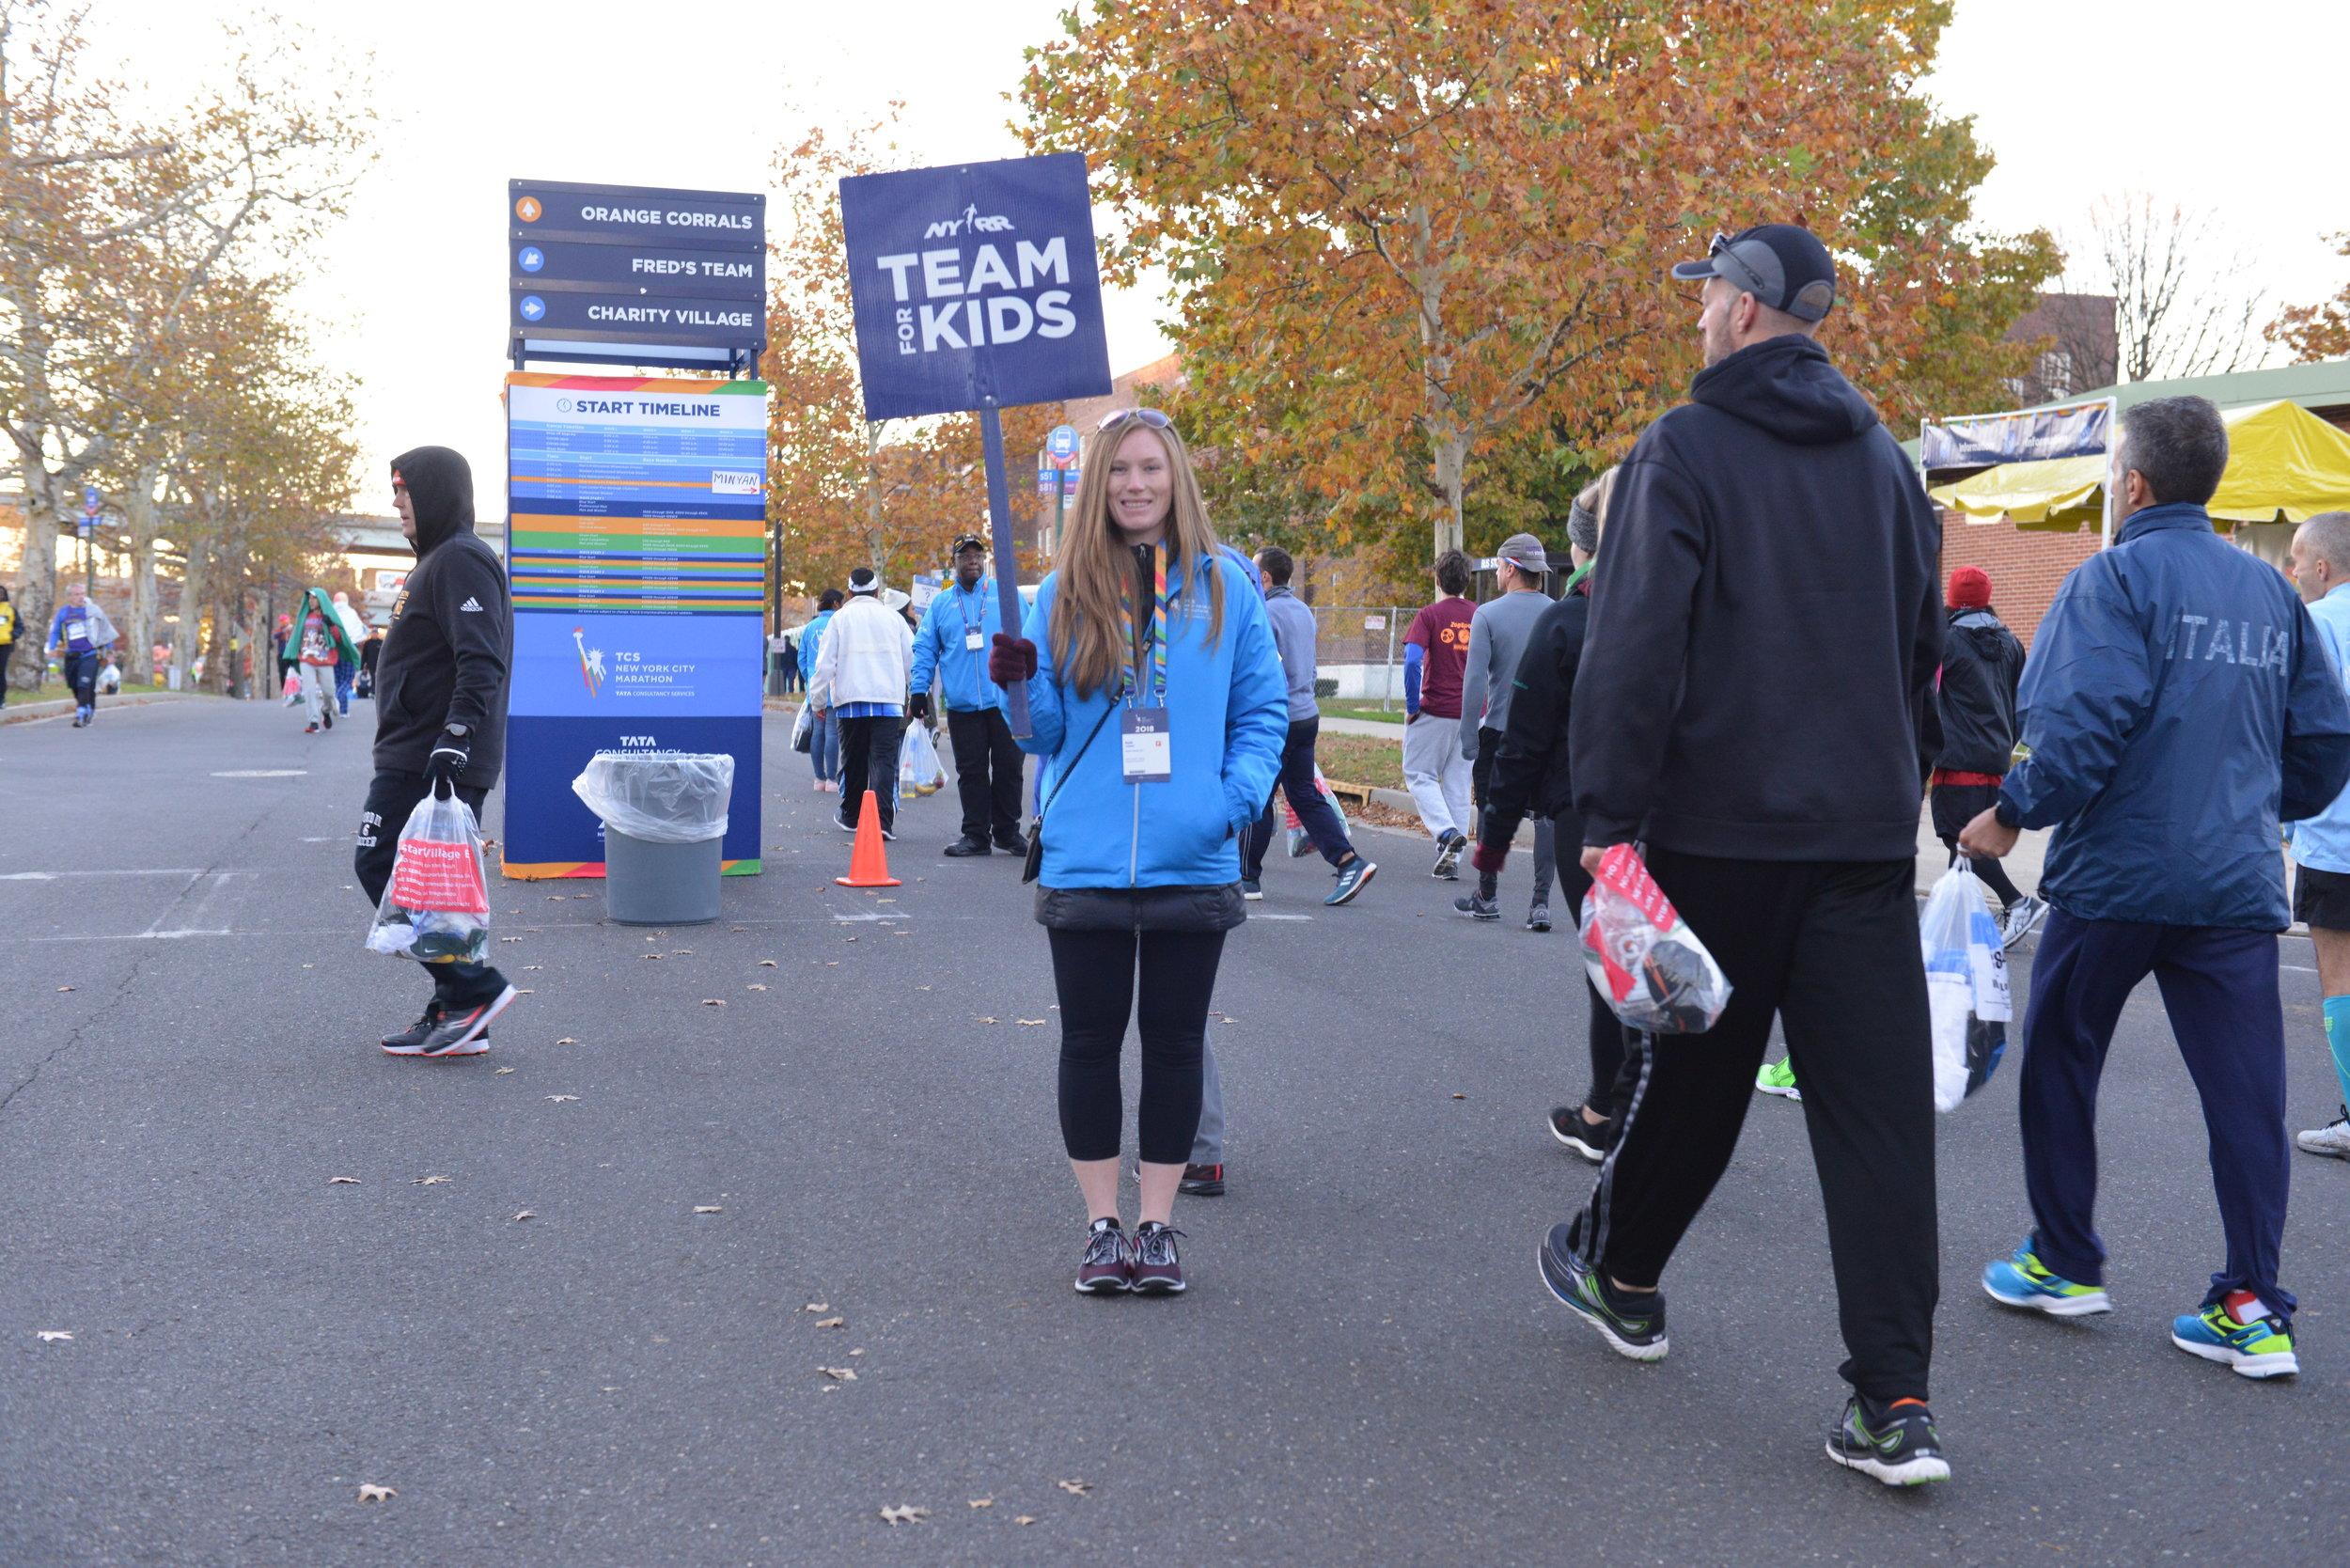 A volunteer at the TCS New York City Marathon start area.